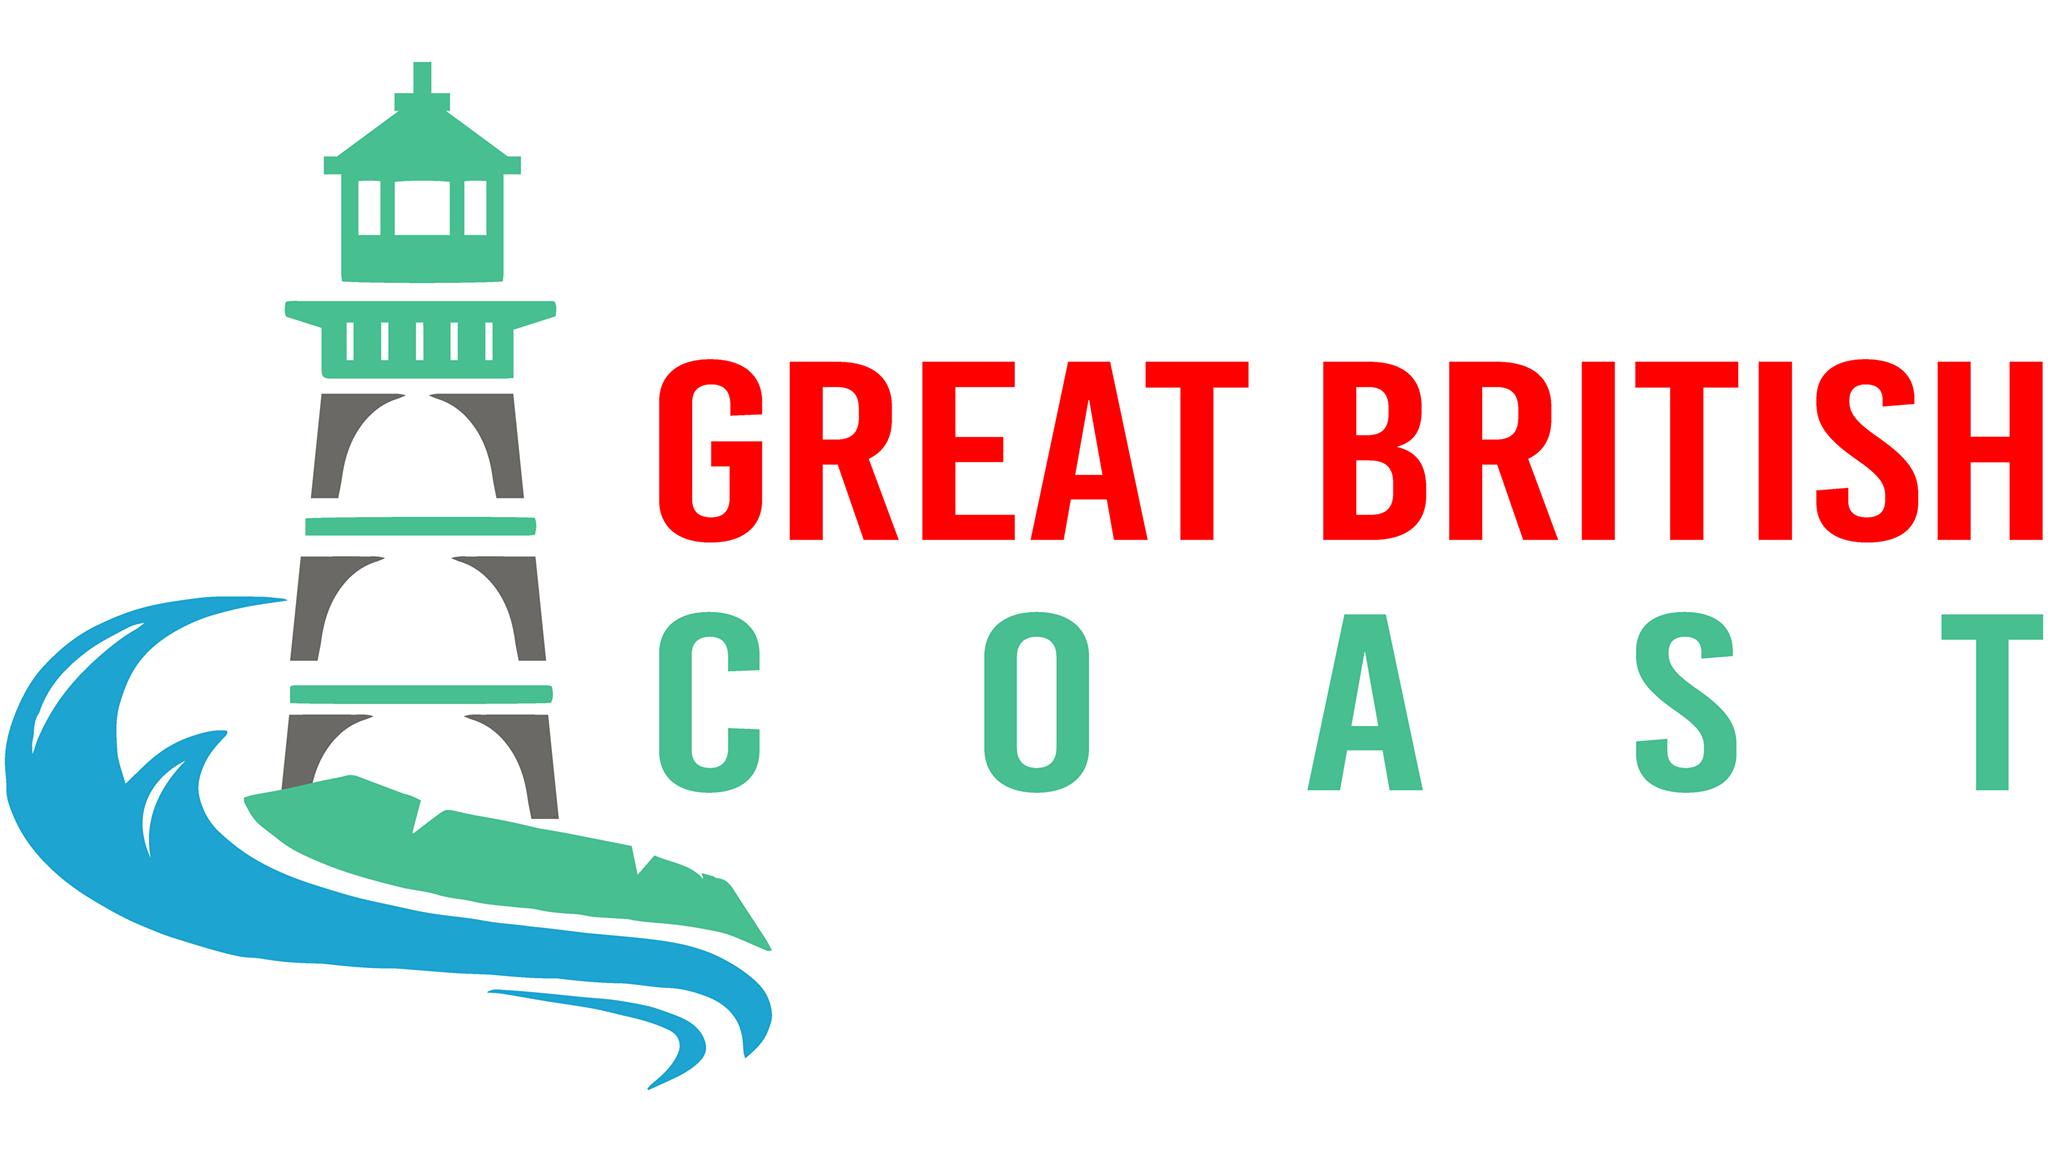 Great British Coast